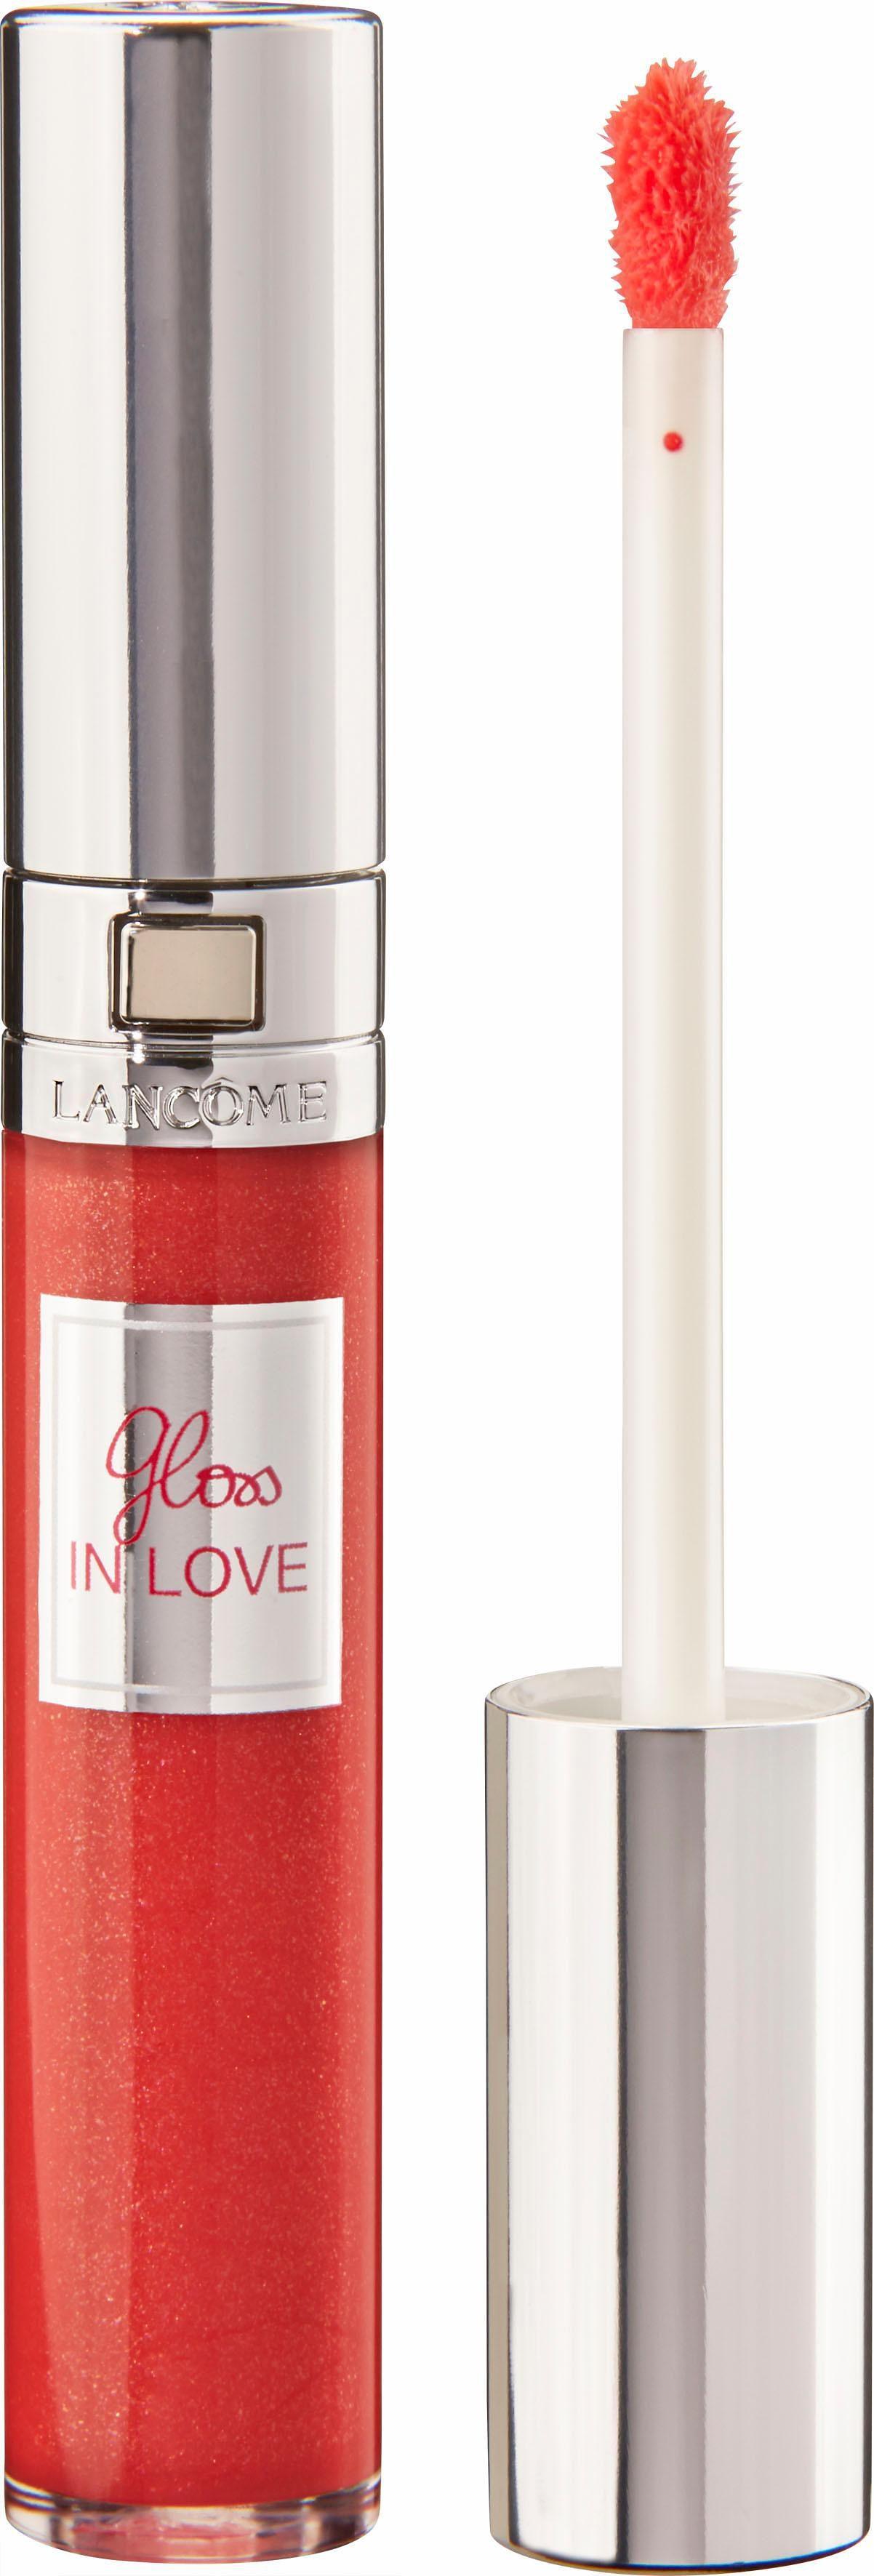 Lancôme, »Gloss in Love«, Lipgloss